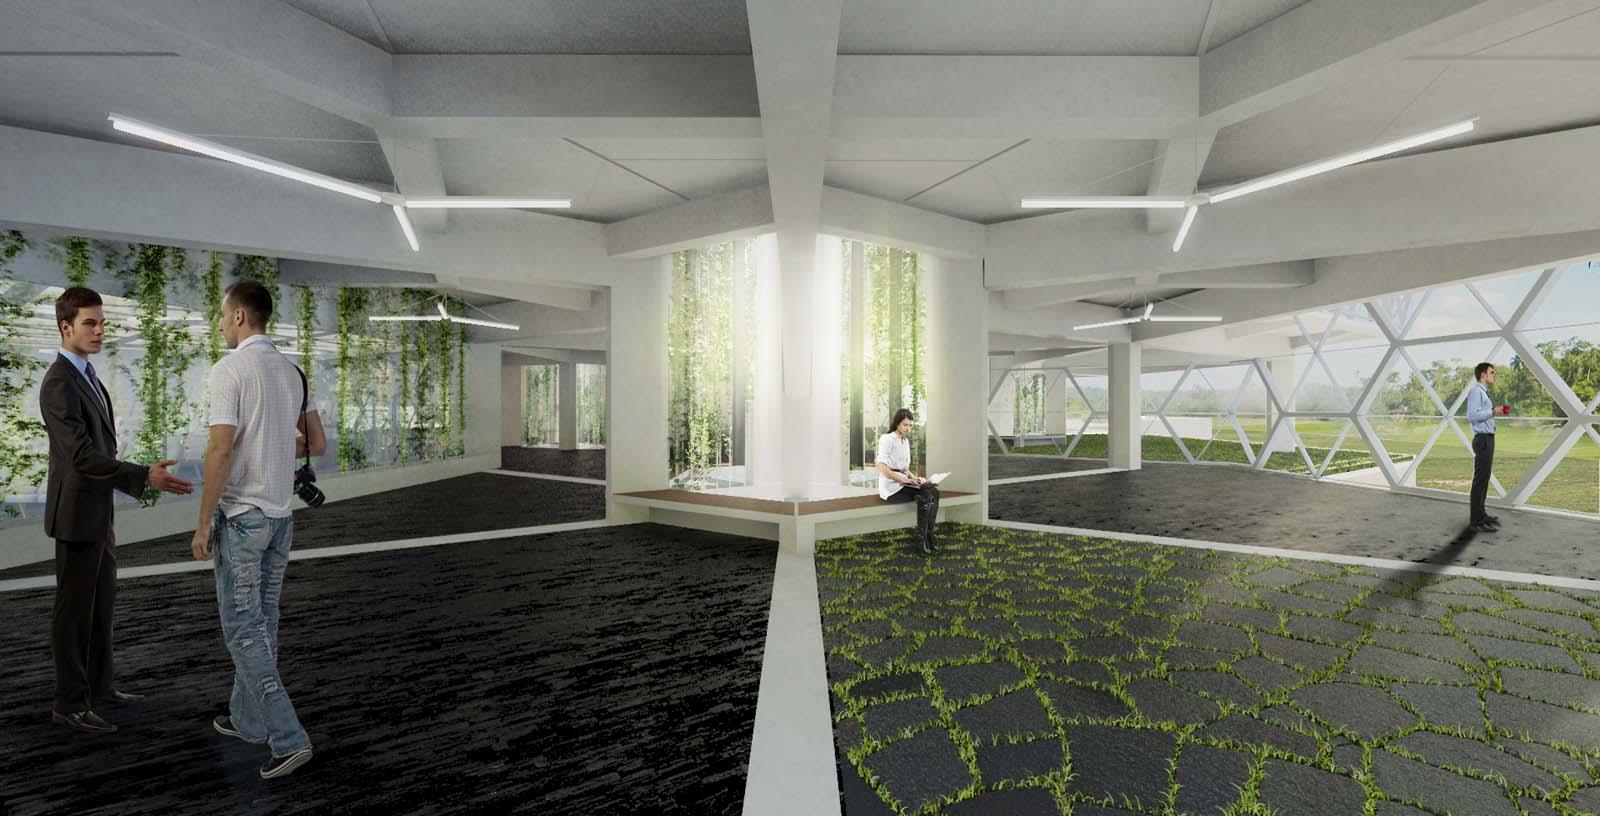 Energy_Control_Centre_03_Architecture_Idom_computer_graphics_Andreia_Faley